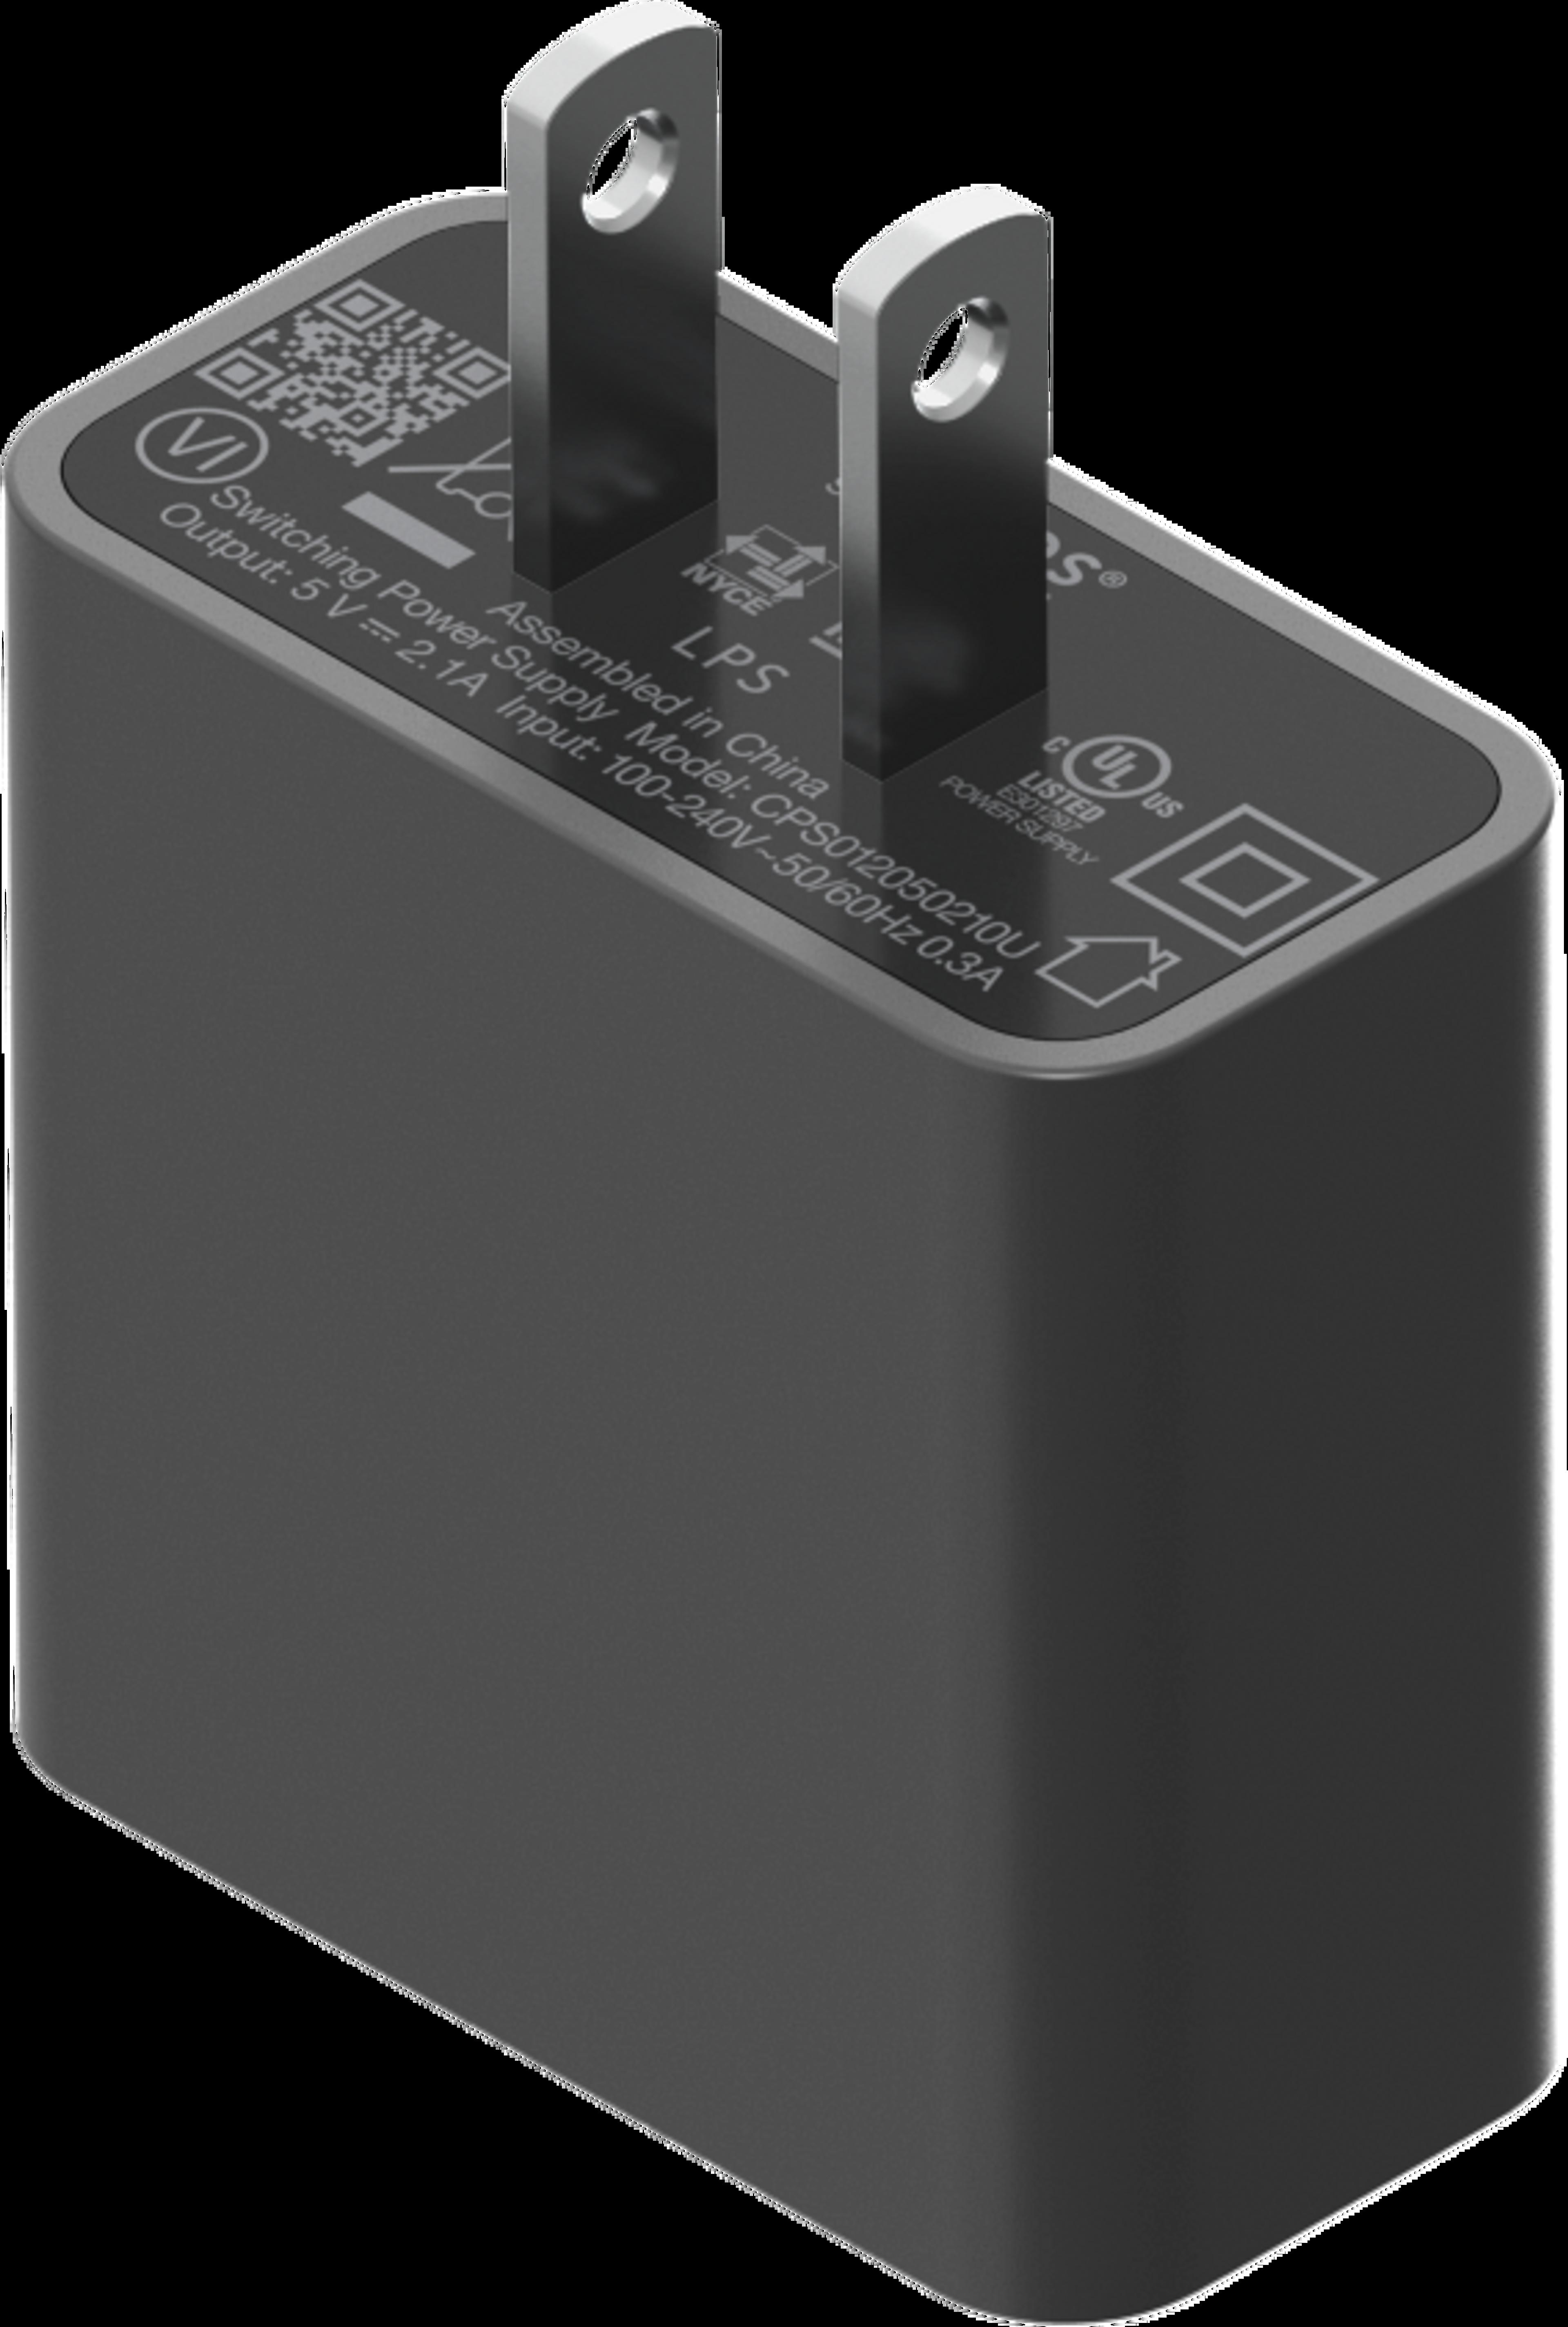 Roam 10W USB power adapter shadow black